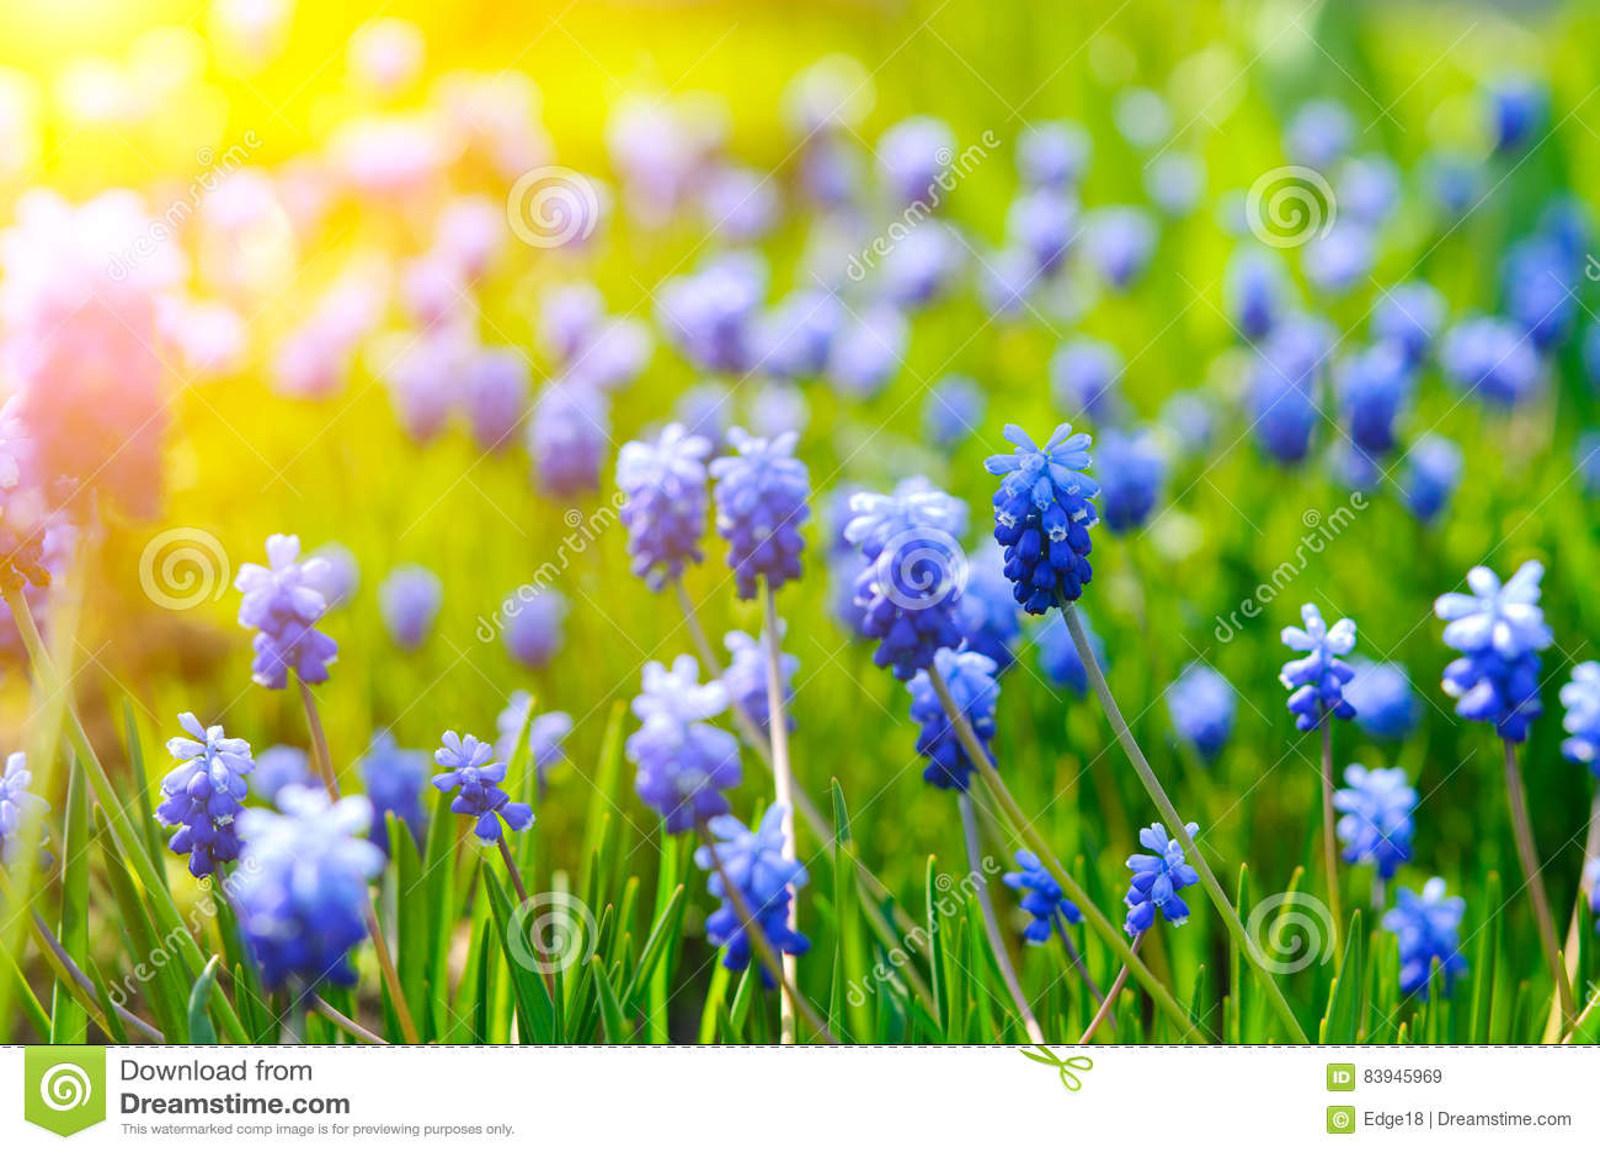 Many Grape Hyacinth Or Muscari Latifolium Botryoides Flower Bulbs